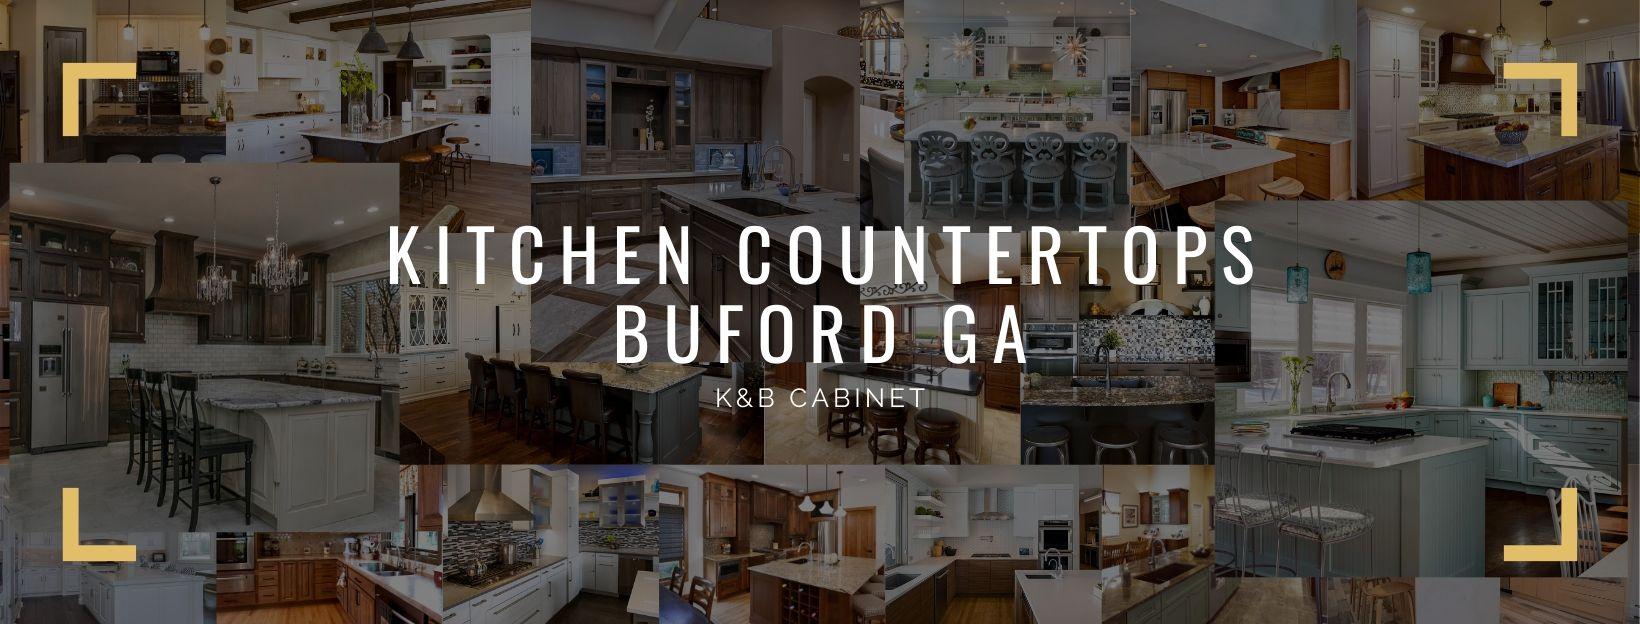 Kitchen Countertops Buford GA